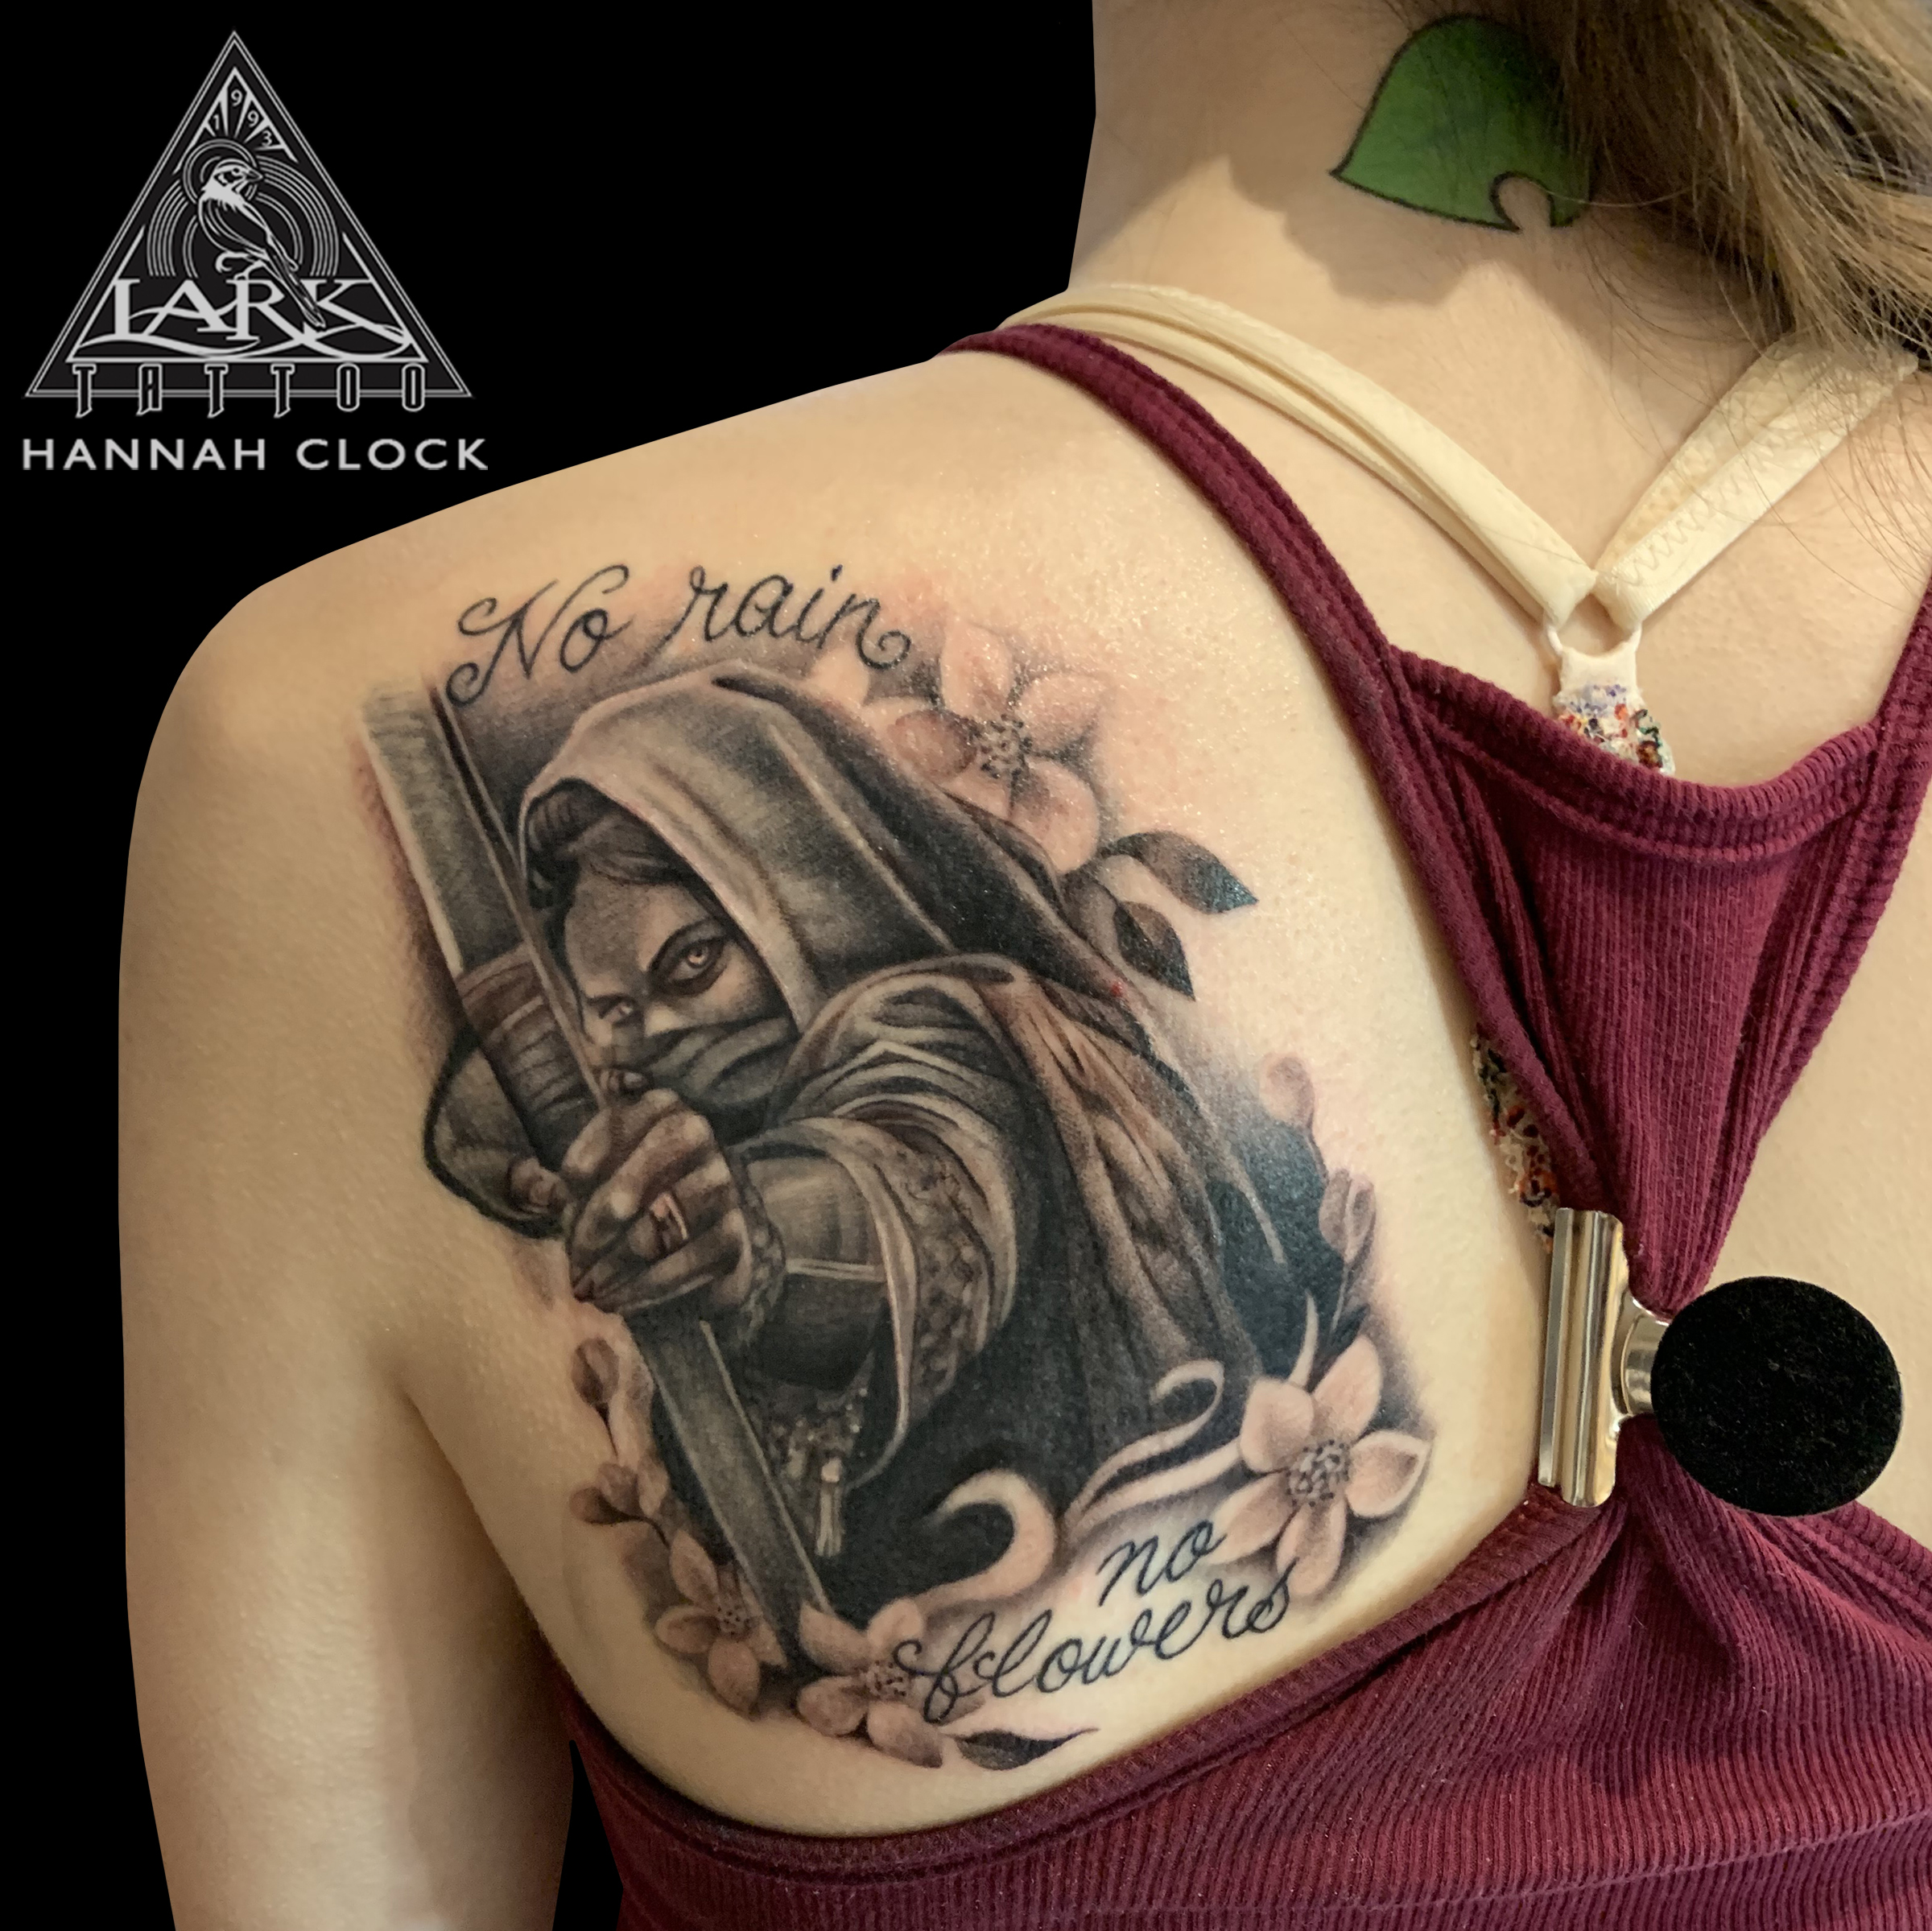 LarkTattoo, BNG, BNGTattoo, FemaleArtist, FemaleTattooer, LadyTattooer, BlackAndGray, BlackAndGrayTattoo, BlackAndGrey, BlackAndGreyTattoo, Flower, FlowerTattoo, Tattoo, Tattoos , TattooArtist, Tattoist, Tattooer, LongIslandTattooArtist, LongIslandTattooer, LongIslandTattoo, TattooOfTheDay, Tat, Tats, Tatts, Tatted, Inked, Ink, TattooInk, AmazingInk, AmazingTattoo, BodyArt, LarkTattooWestbury, Westbury, LongIsland, NY, NewYork, USA, Art, Tattedup, InkedUp, LarkTattoos, HannahClock, HannahClockTattoo, HannahClockLarkTattoo